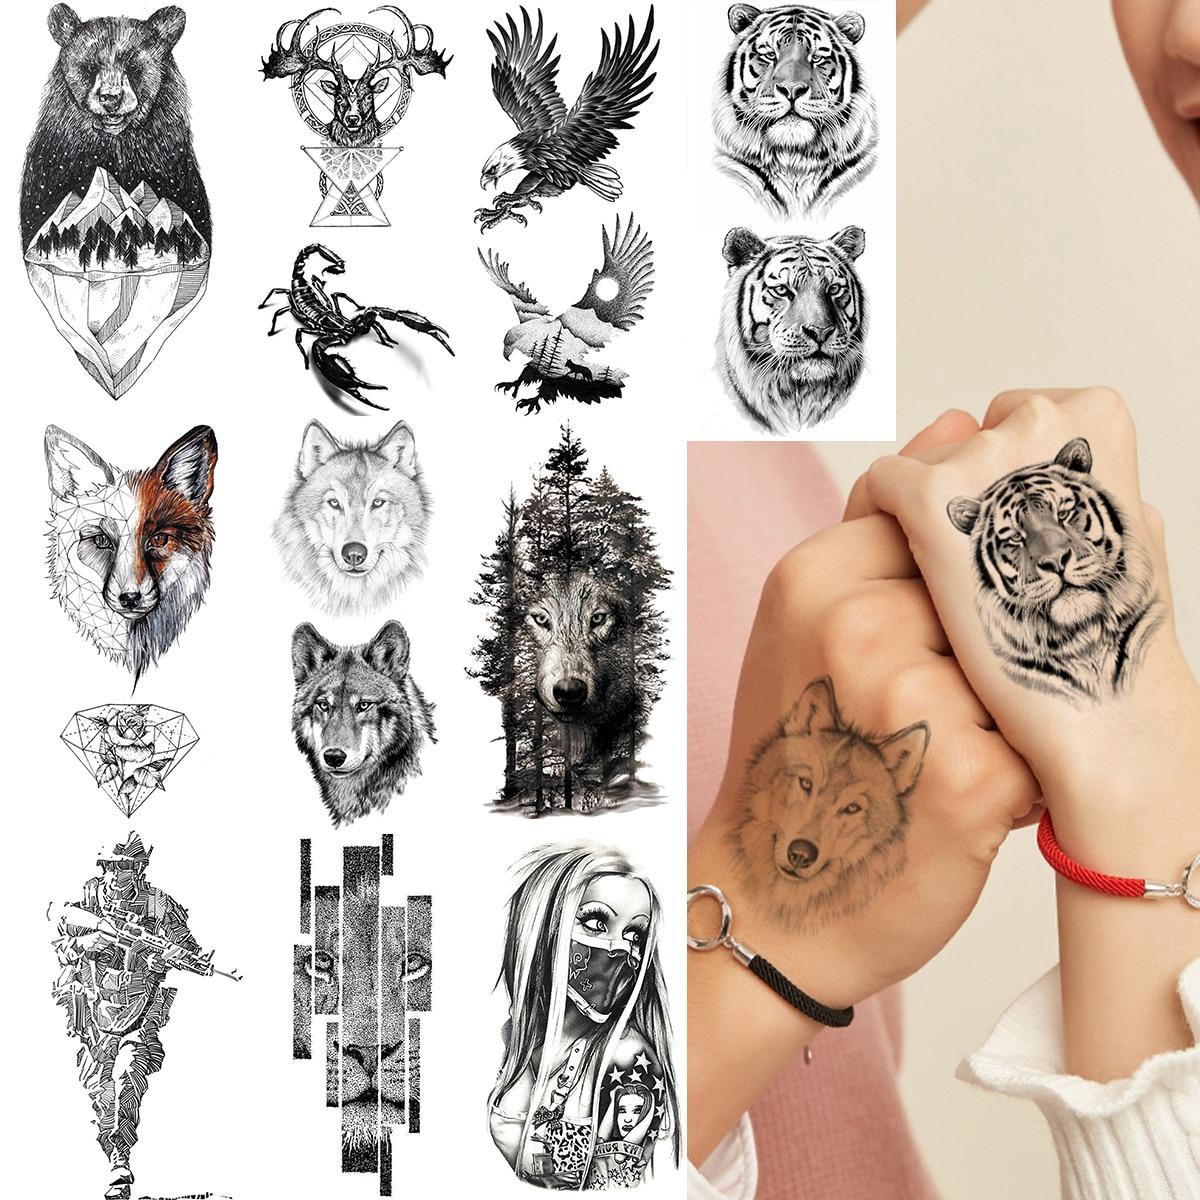 Fiercely Tiger Eagle Temporary Tattoos For Men Women Arm Hand Fake Tattoo Sticker Tigerish King Of Beast Body Art Tatoos Makeup